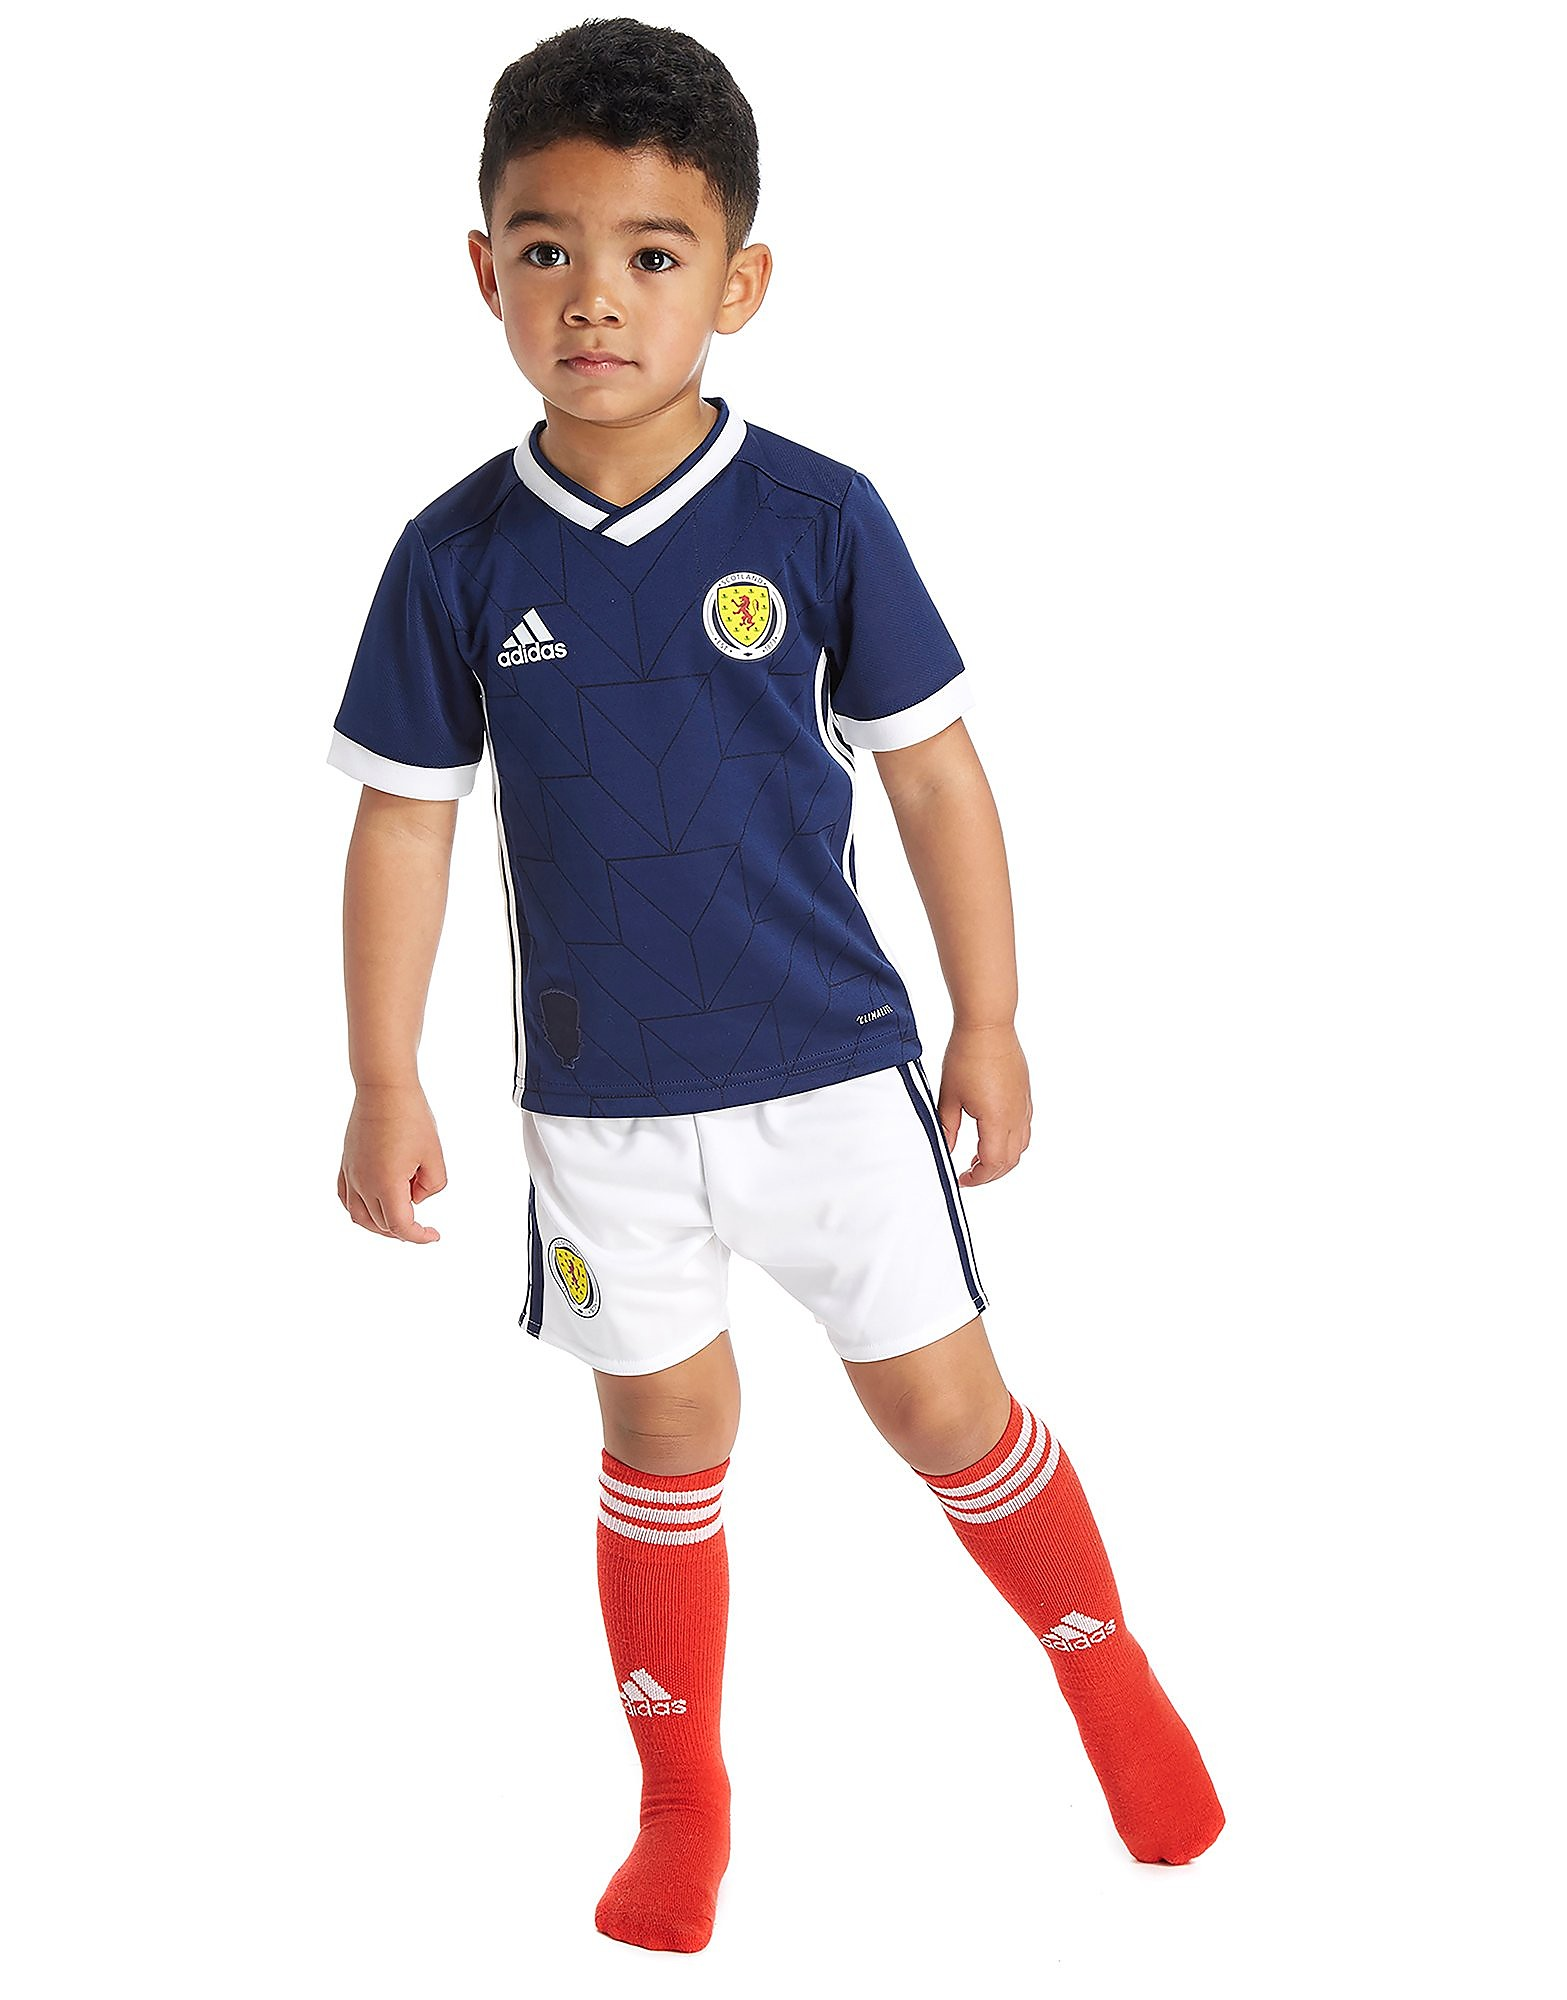 adidas Scozia 2017/18 Completo Home Bambino